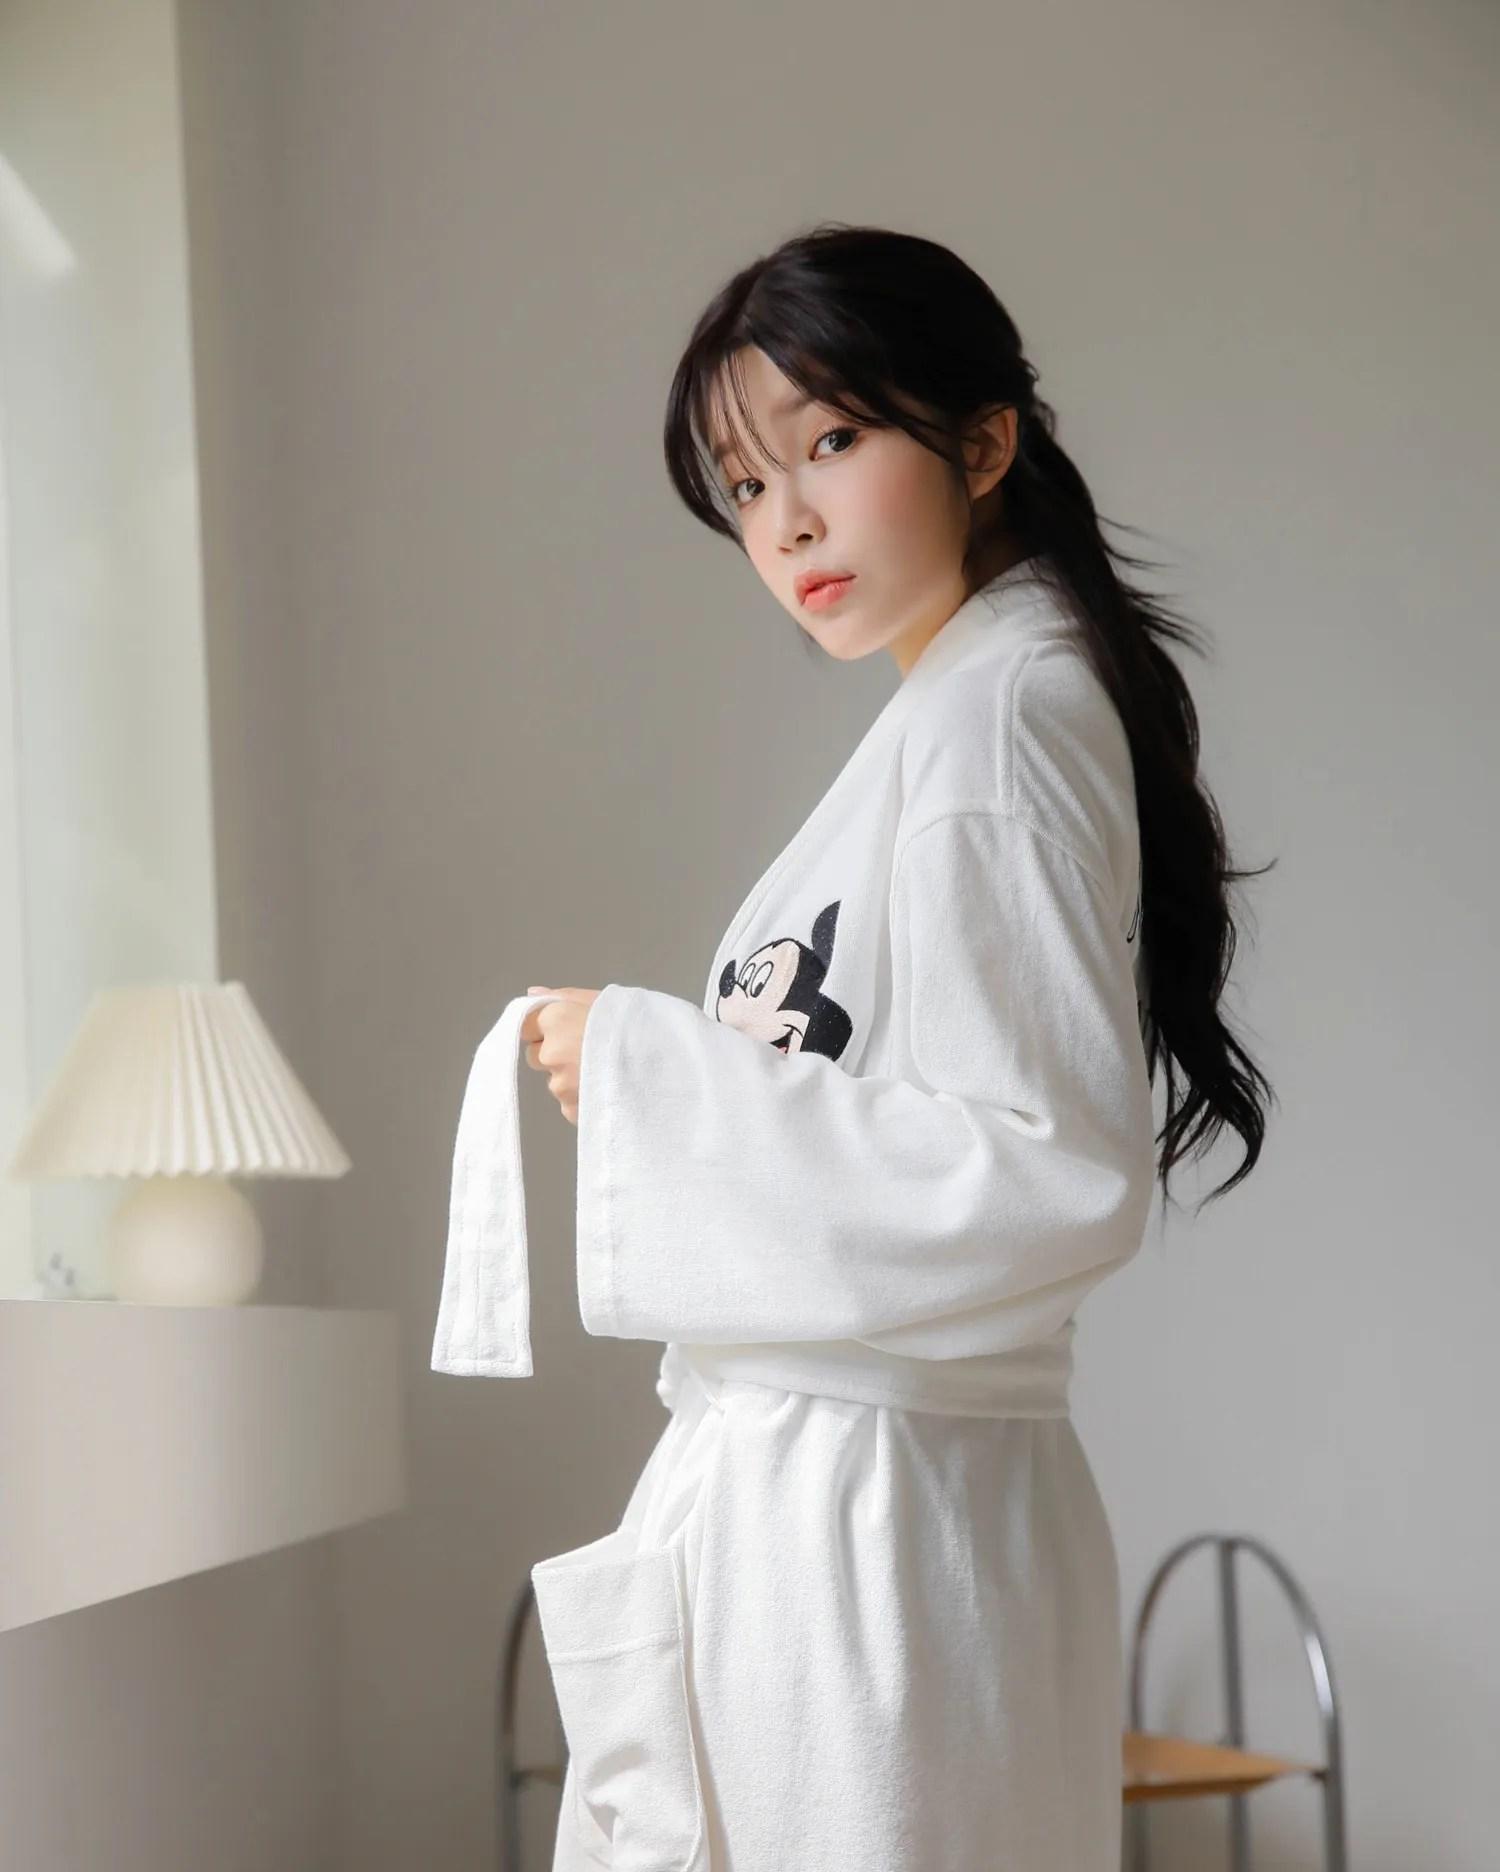 Cha Yoojin / NUDMALL / September 2021 / Daily Tight Lingerie